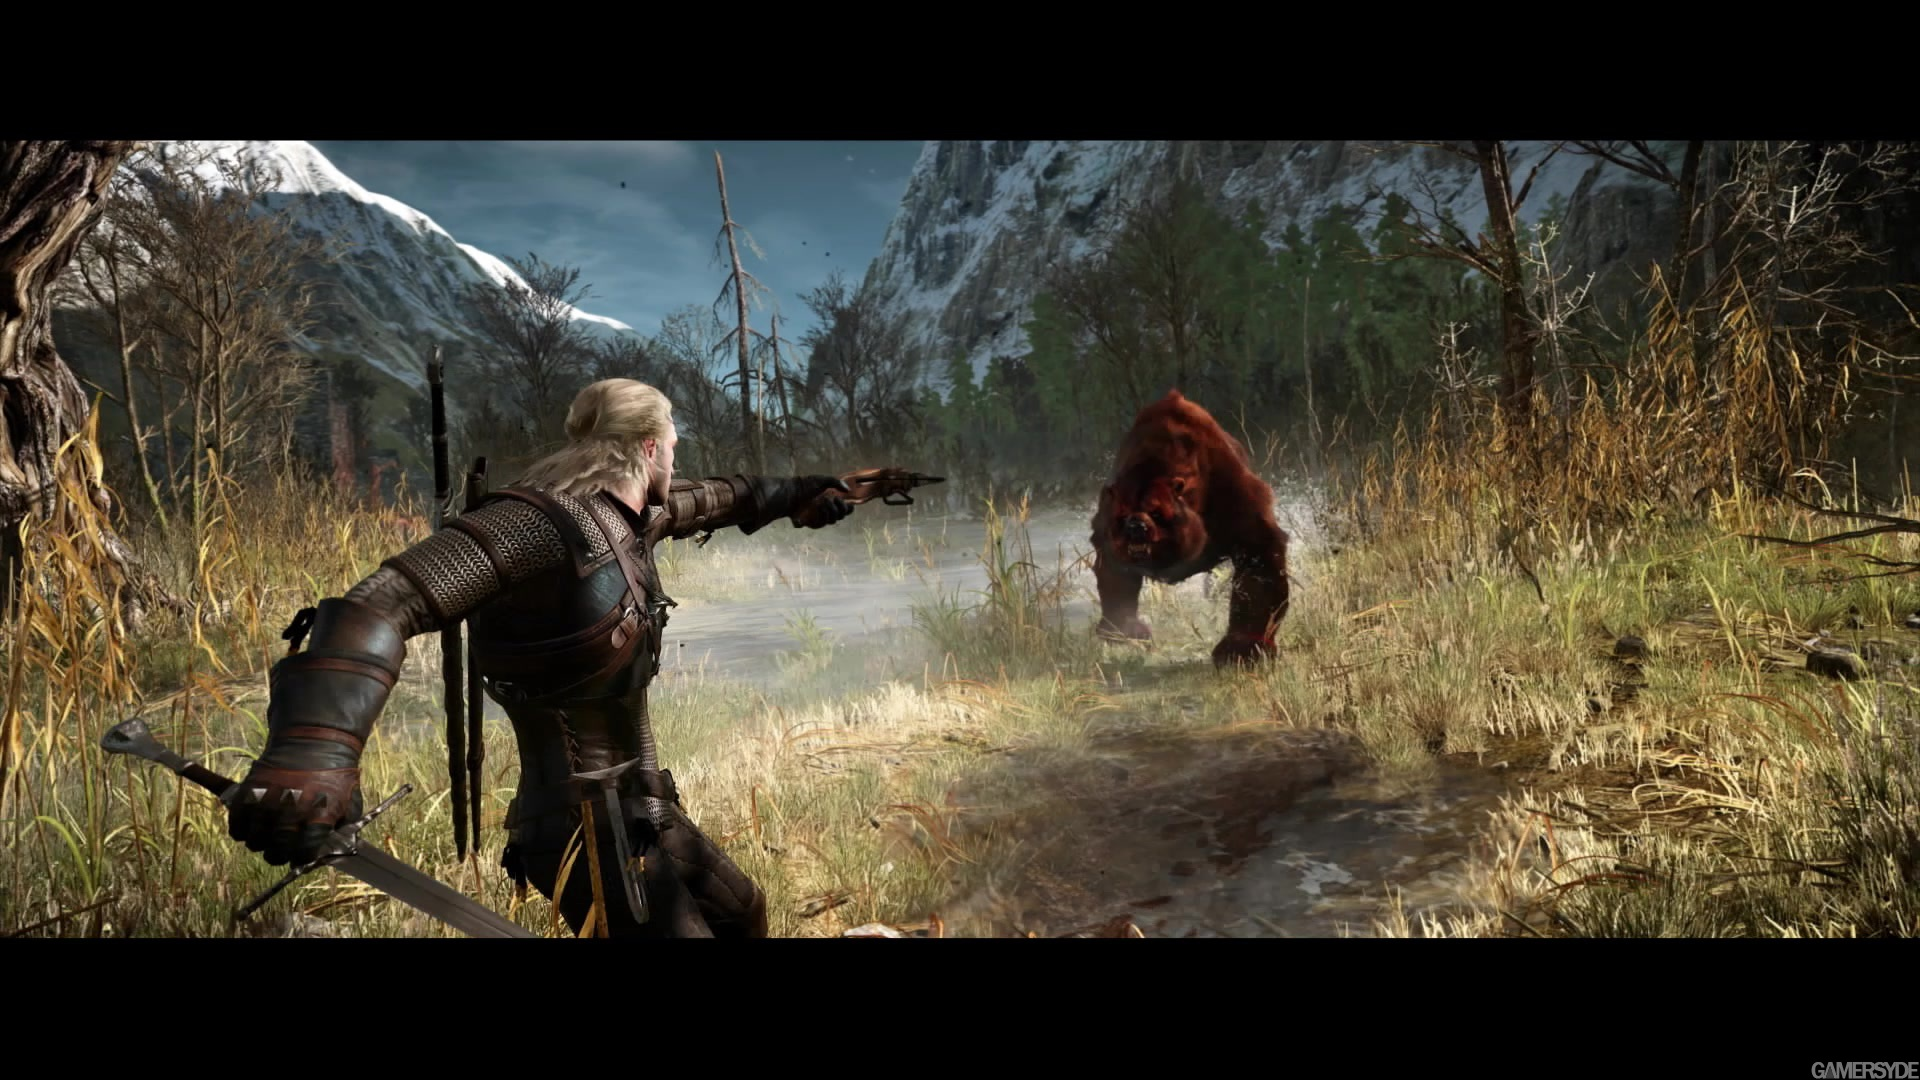 http://images.gamersyde.com/image_the_witcher_3_wild_hunt-26388-2651_0012.jpg